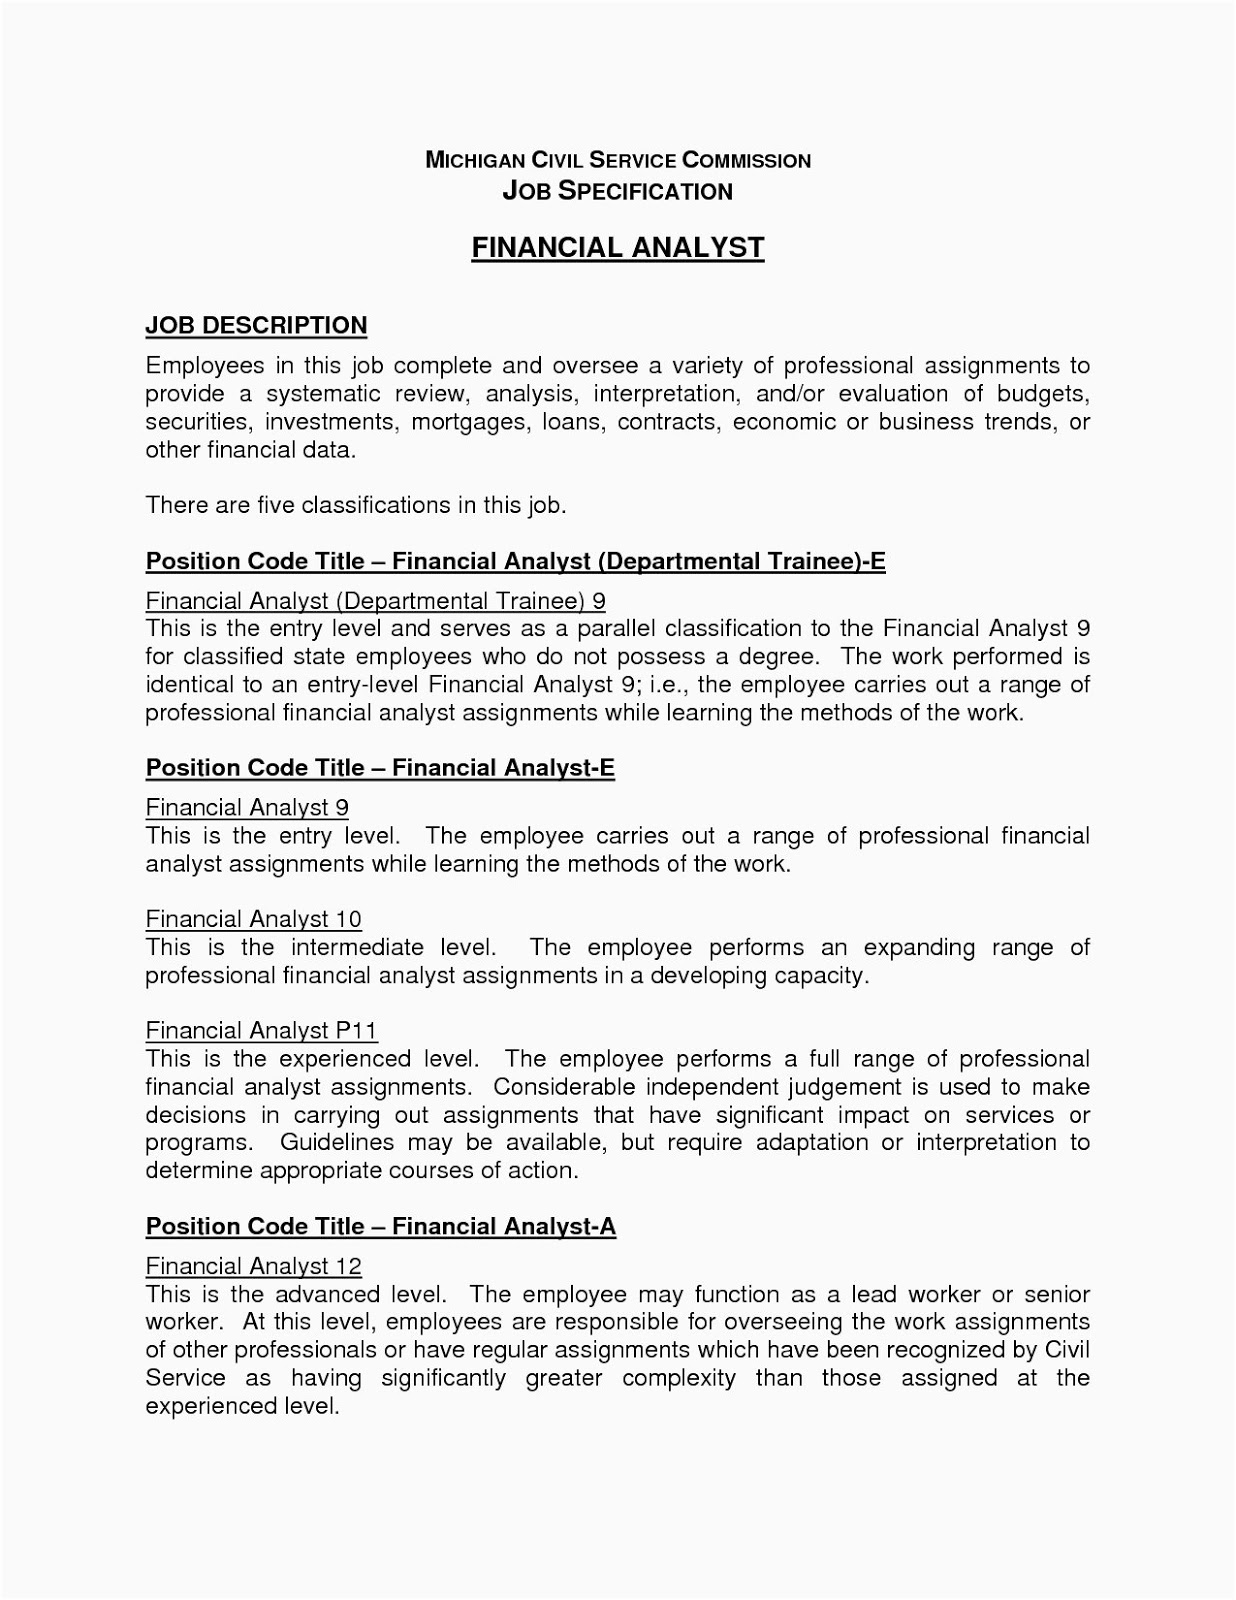 indeed job resume 2019 indeed job resume search 2020 indeed job resume search indeed job resume update indeed job resume upload indeed job resume examples